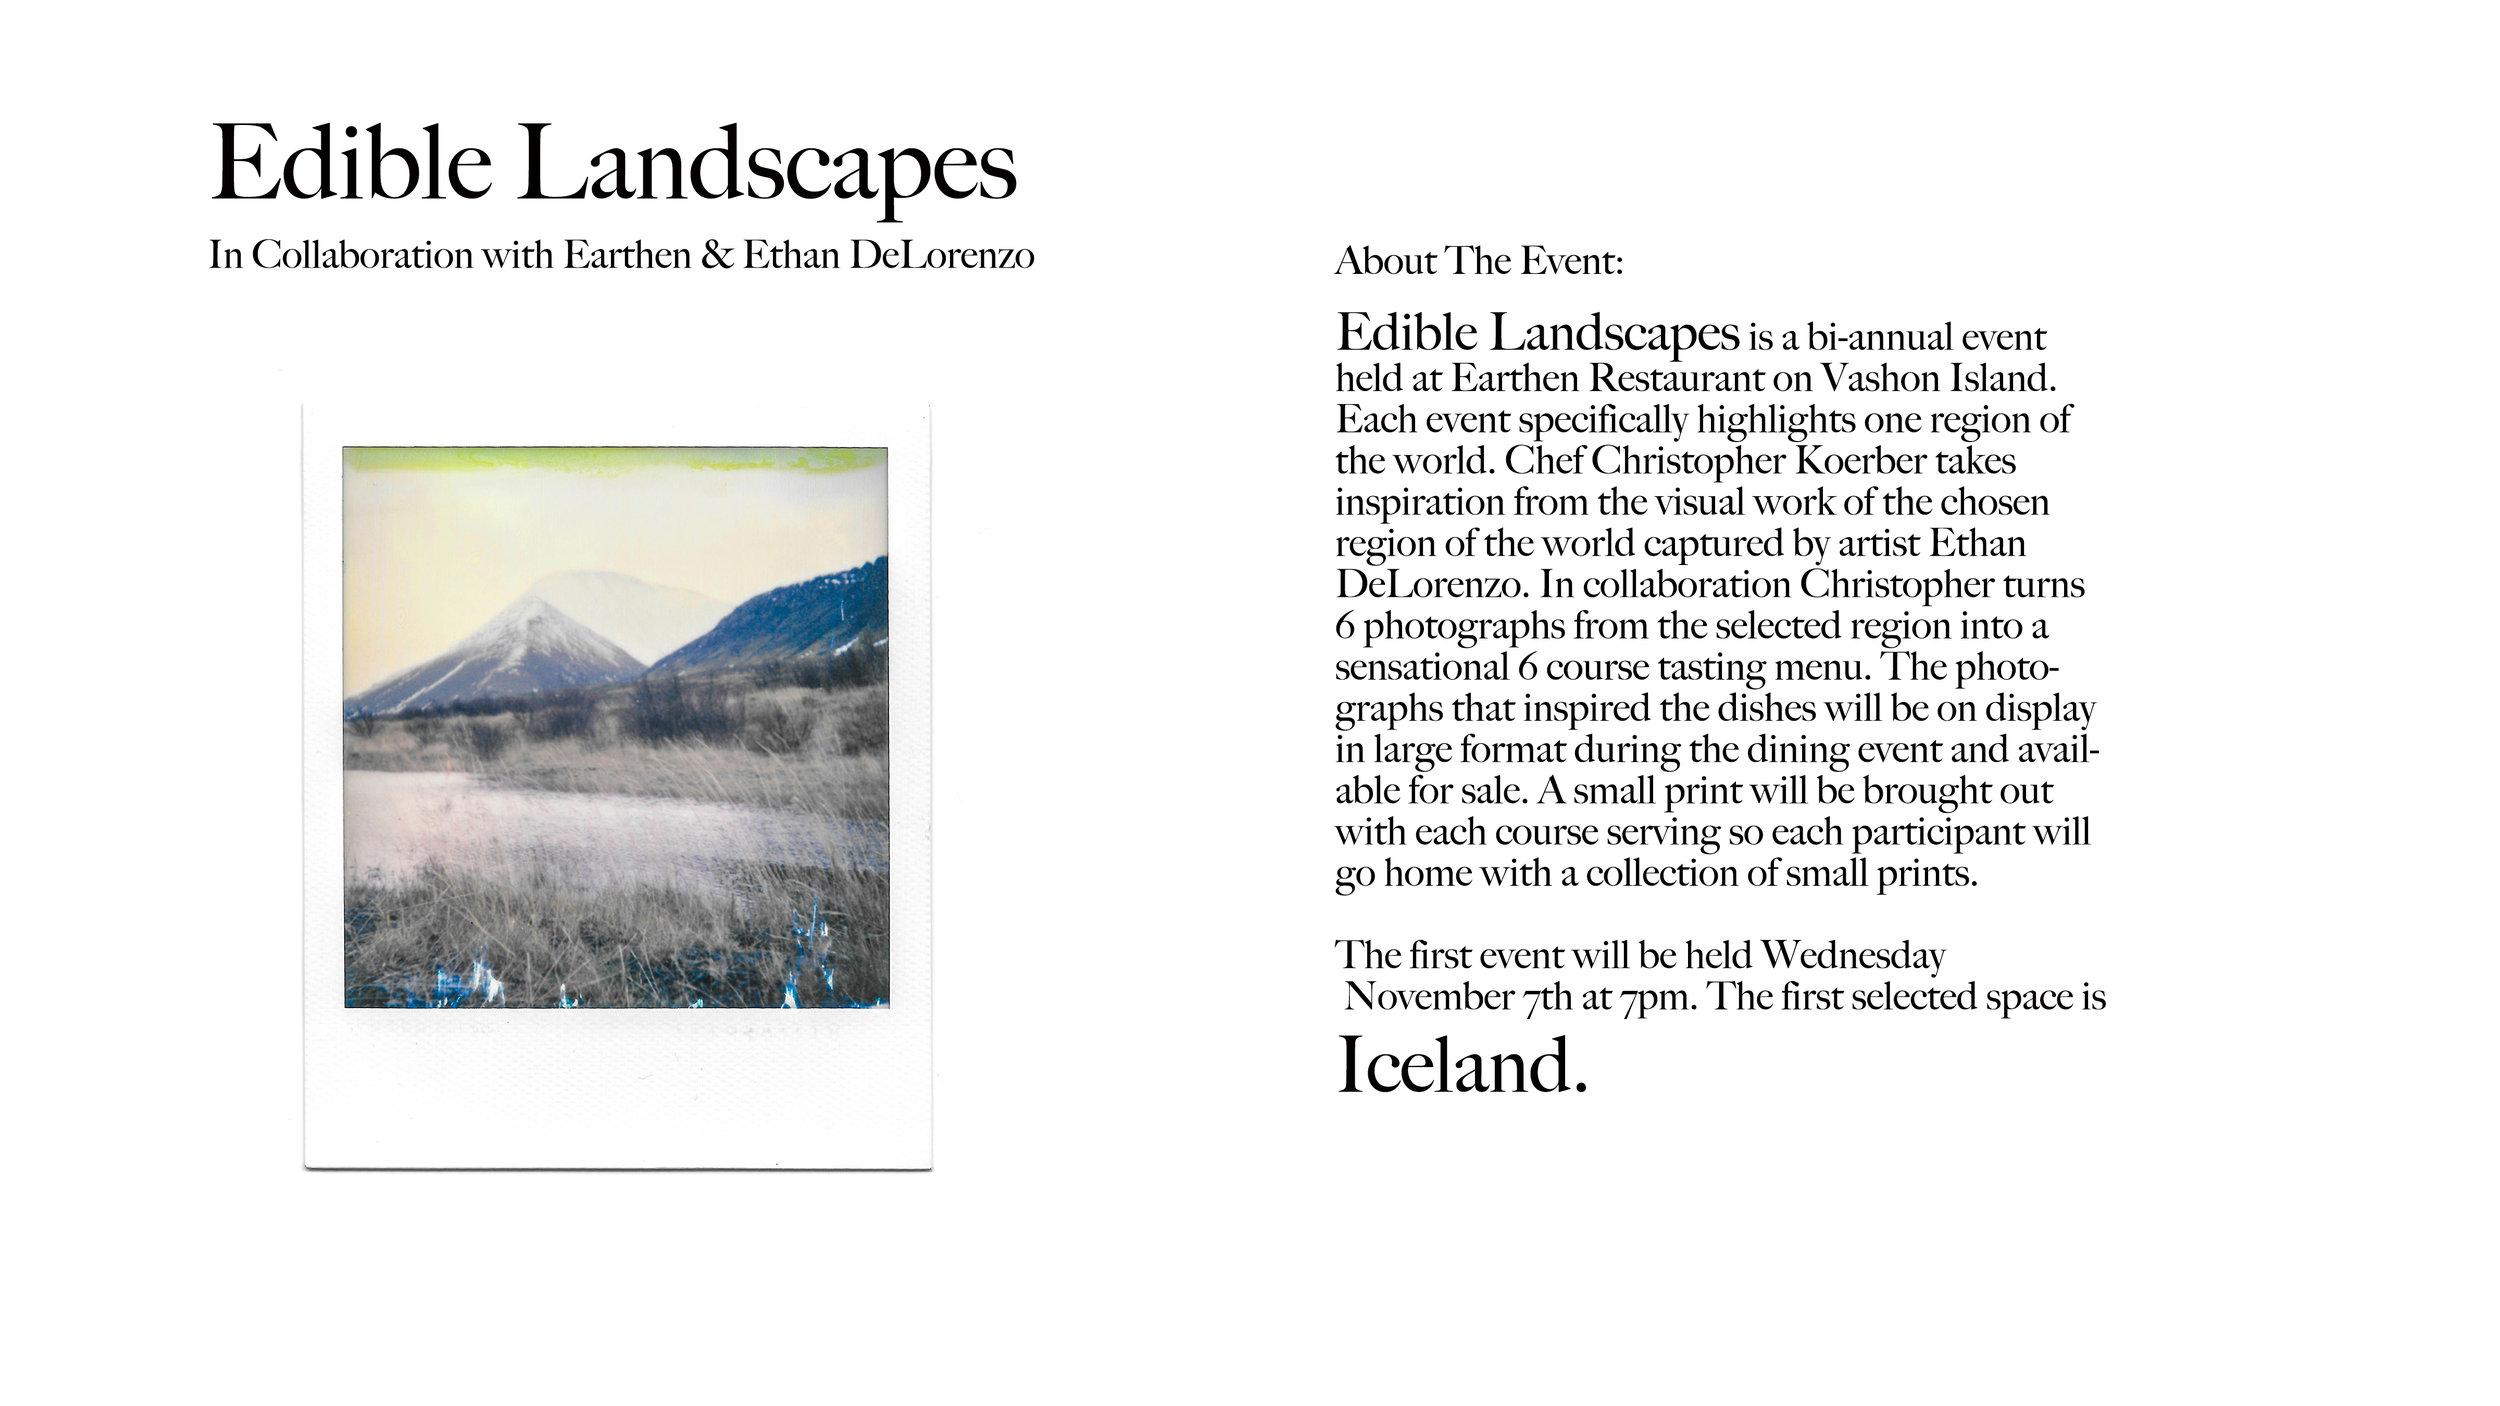 edible landscapes info.jpg